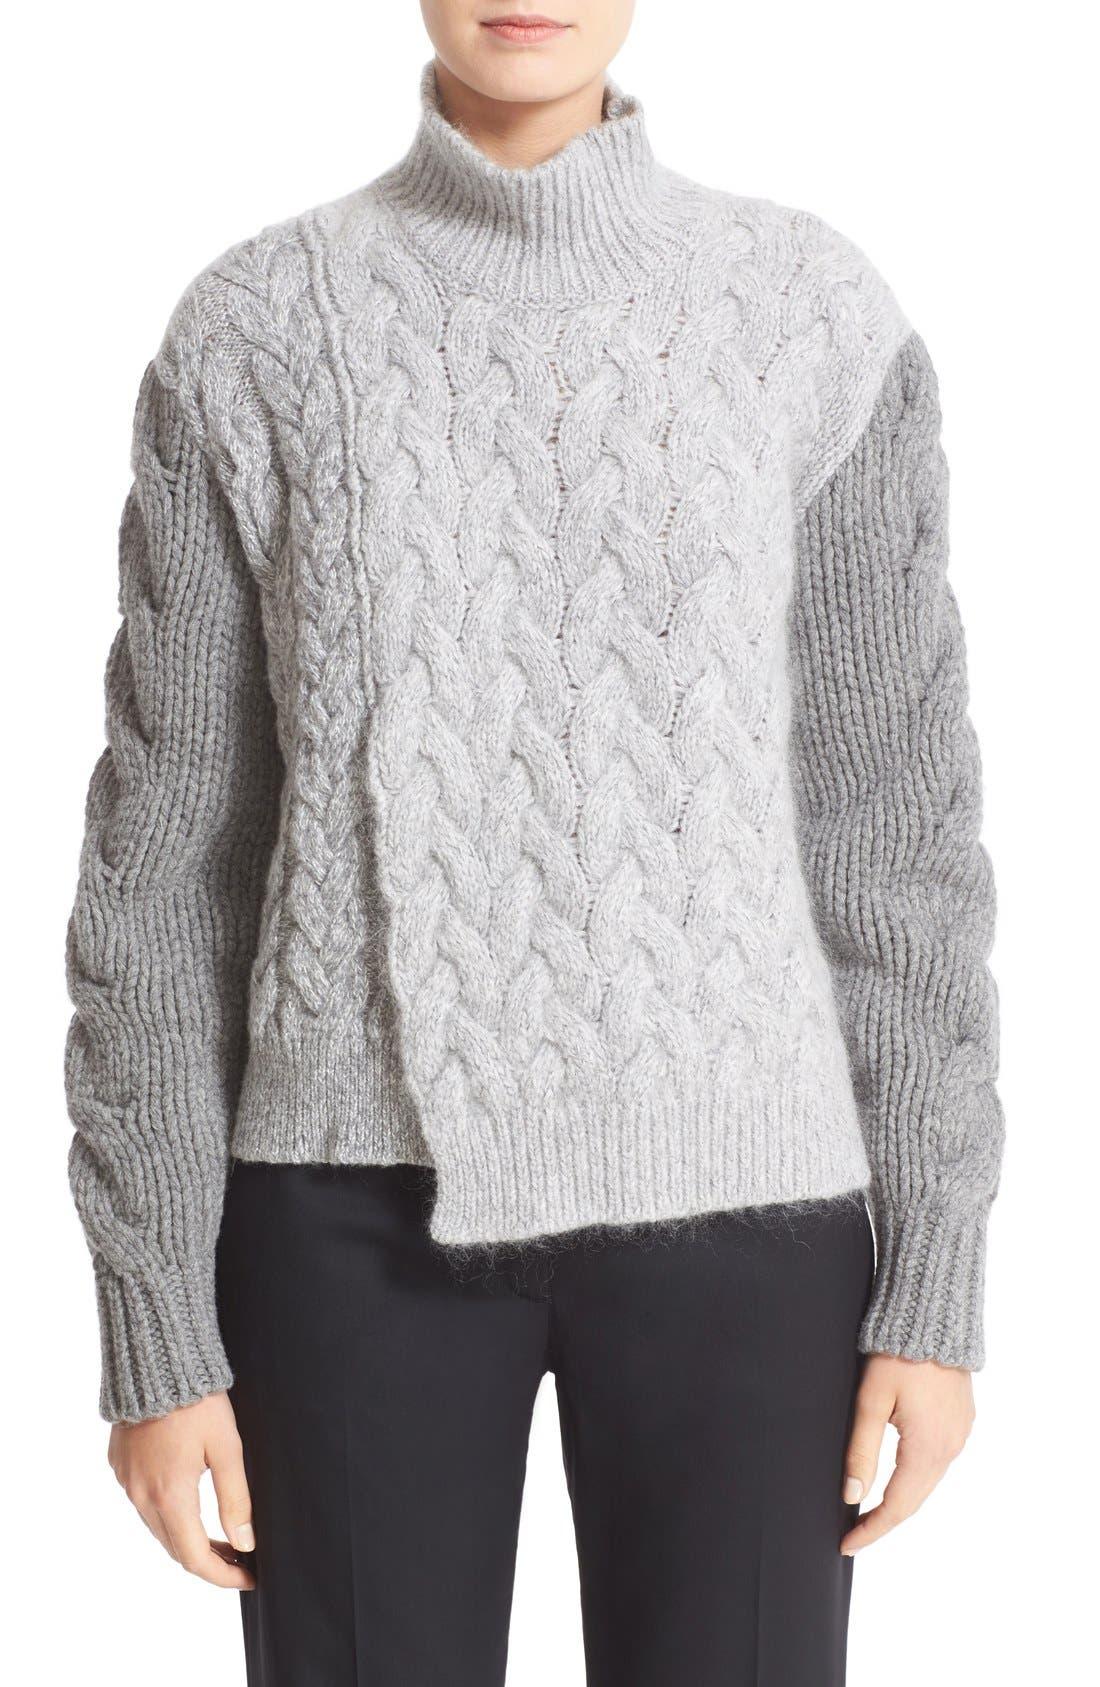 Alternate Image 1 Selected - Stella McCartney Mixed Media Turtleneck Sweater